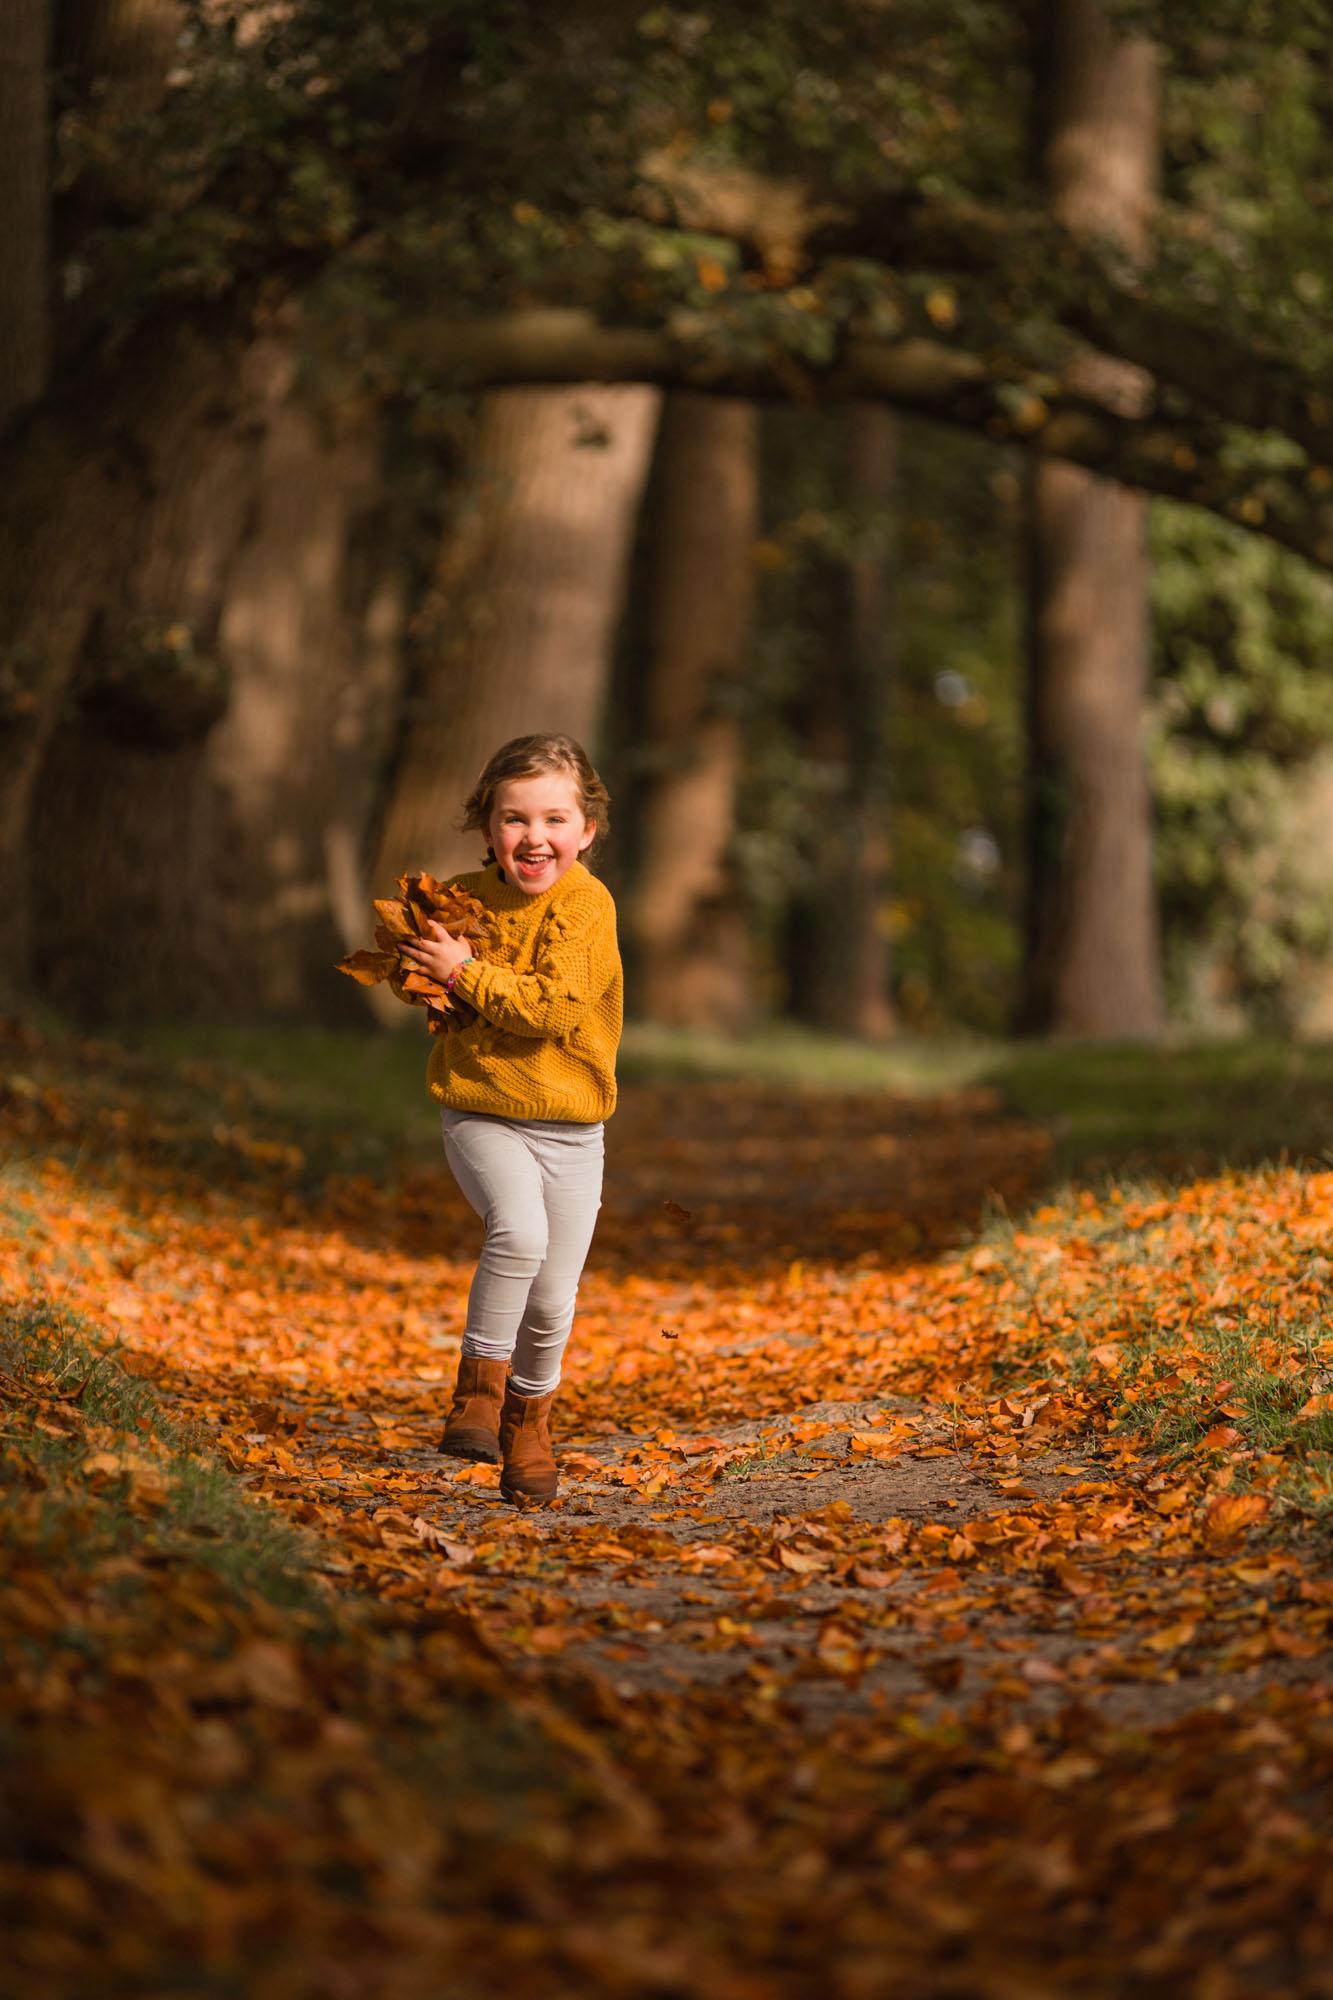 Rennend meisje met handvol herfstbladeren in bos